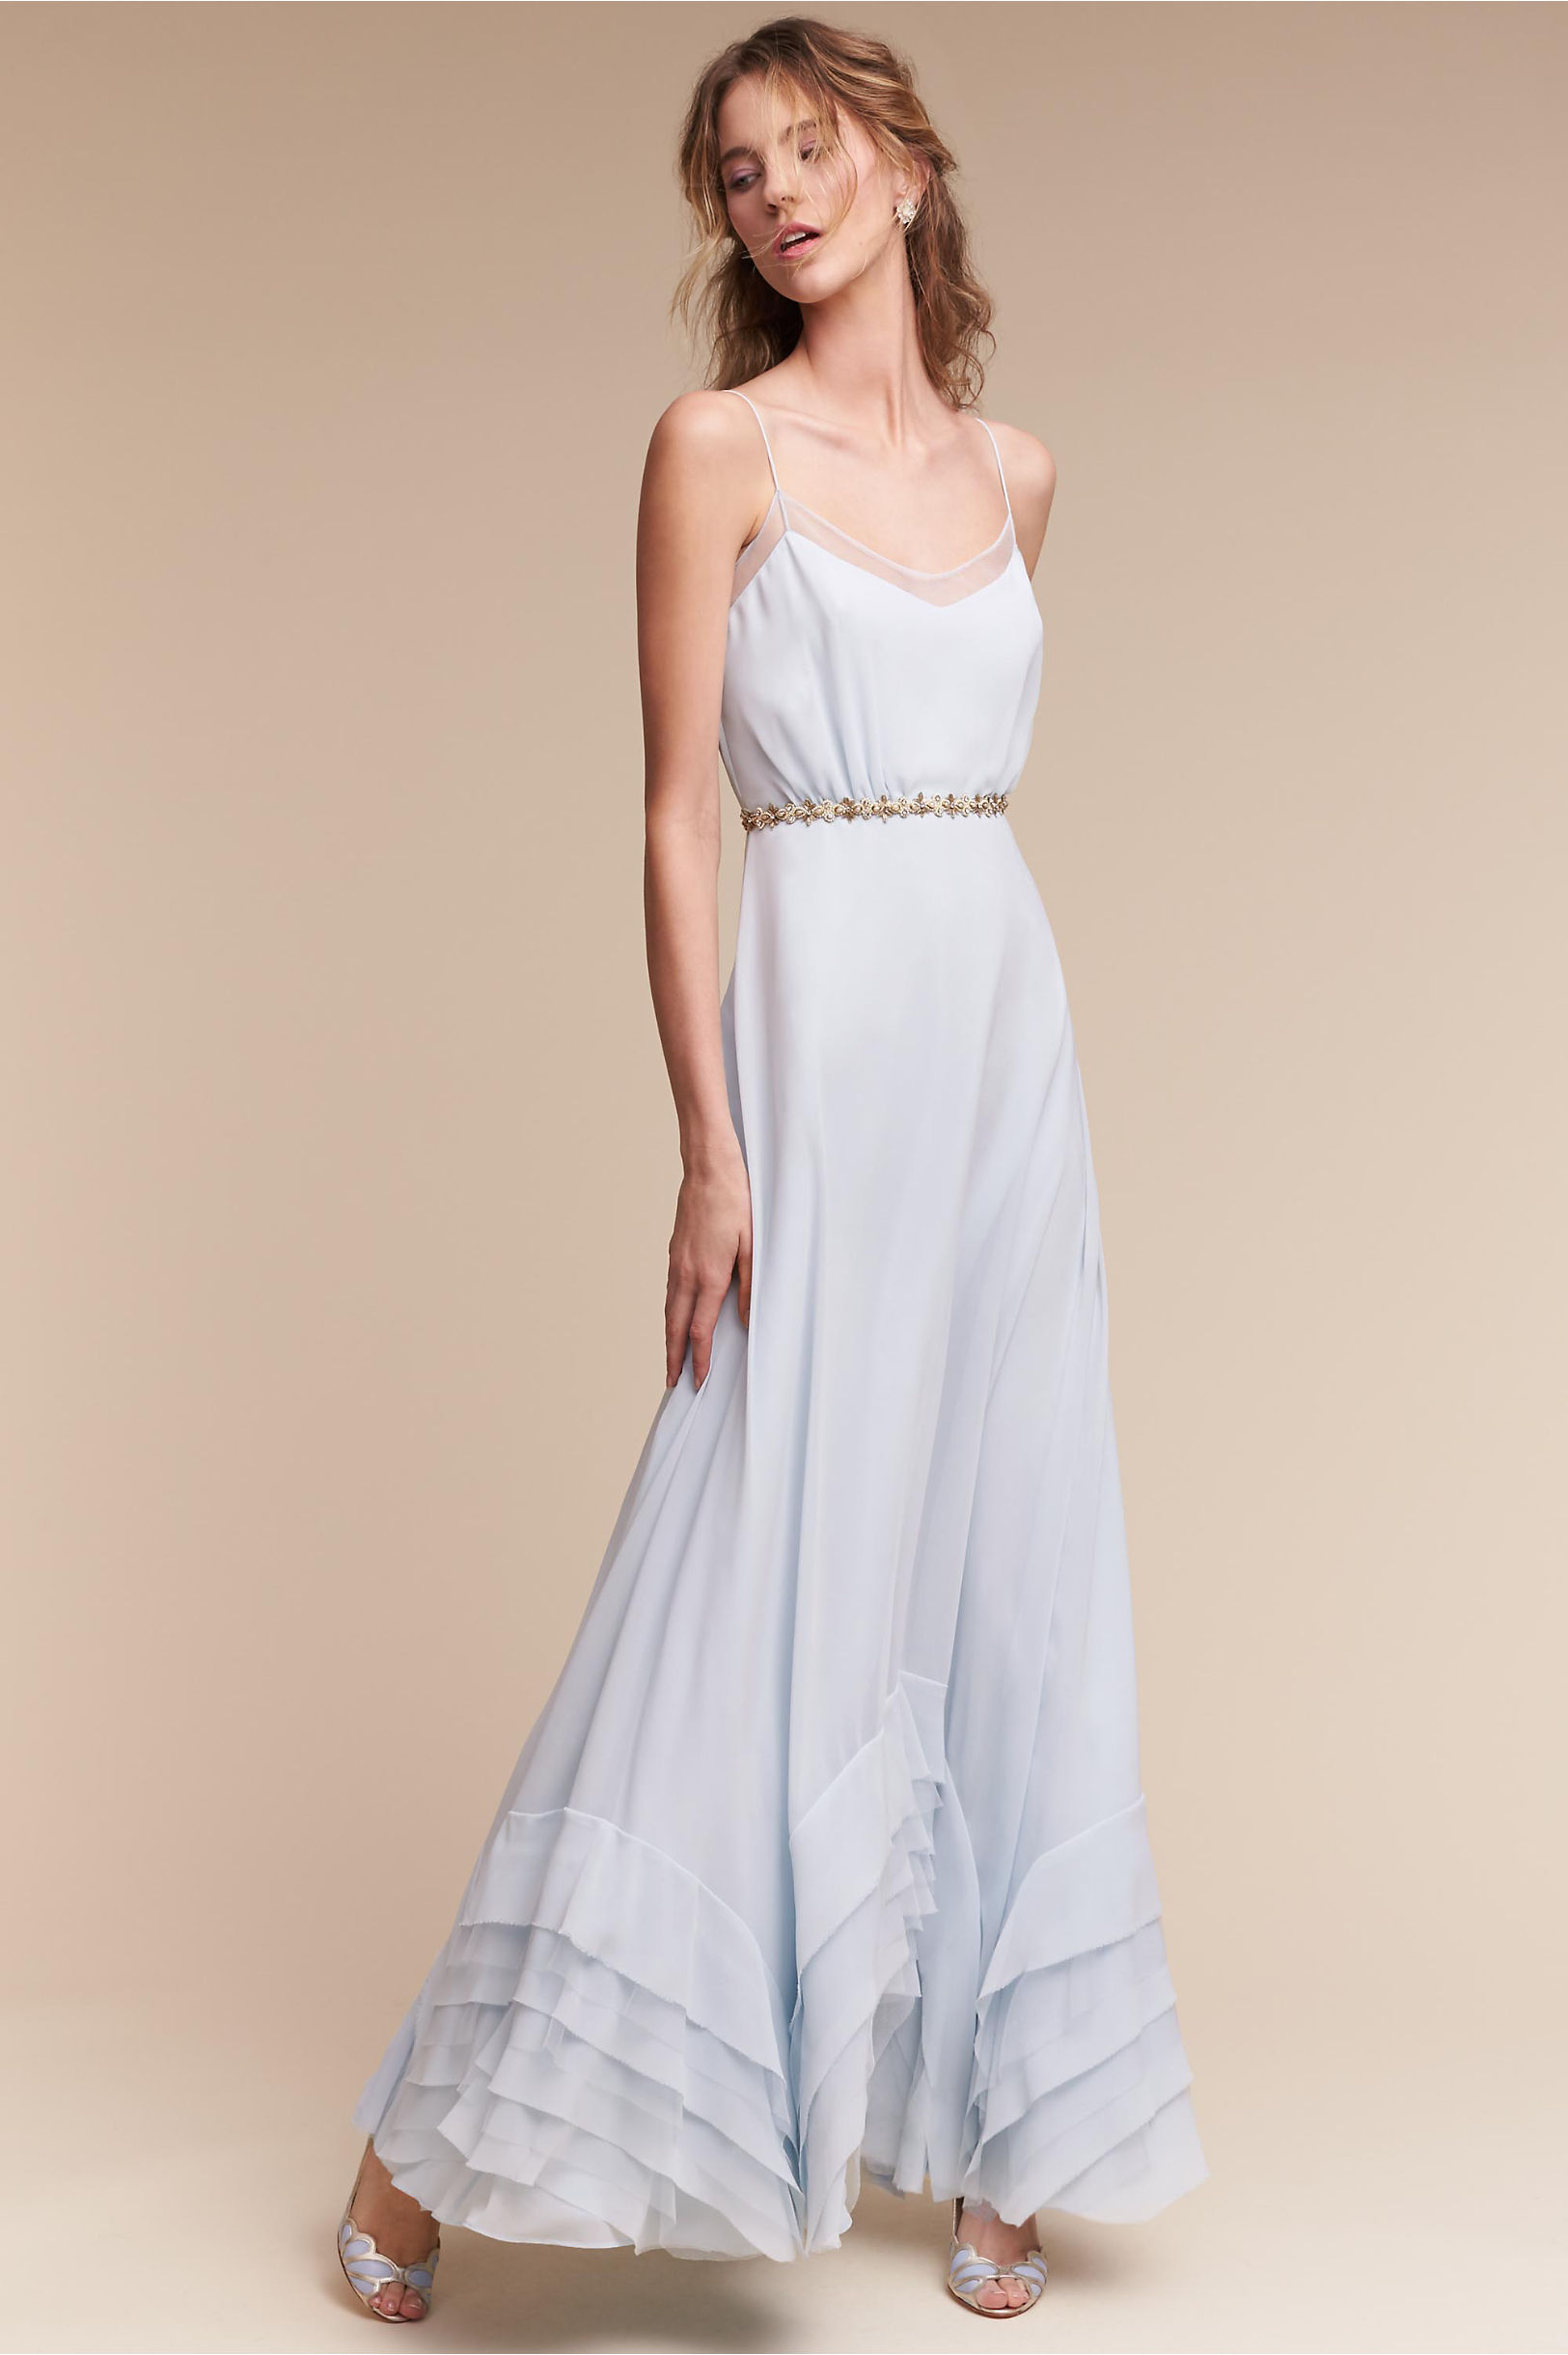 Long Bridesmaid Dresses | Chiffon Styles | BHLDN